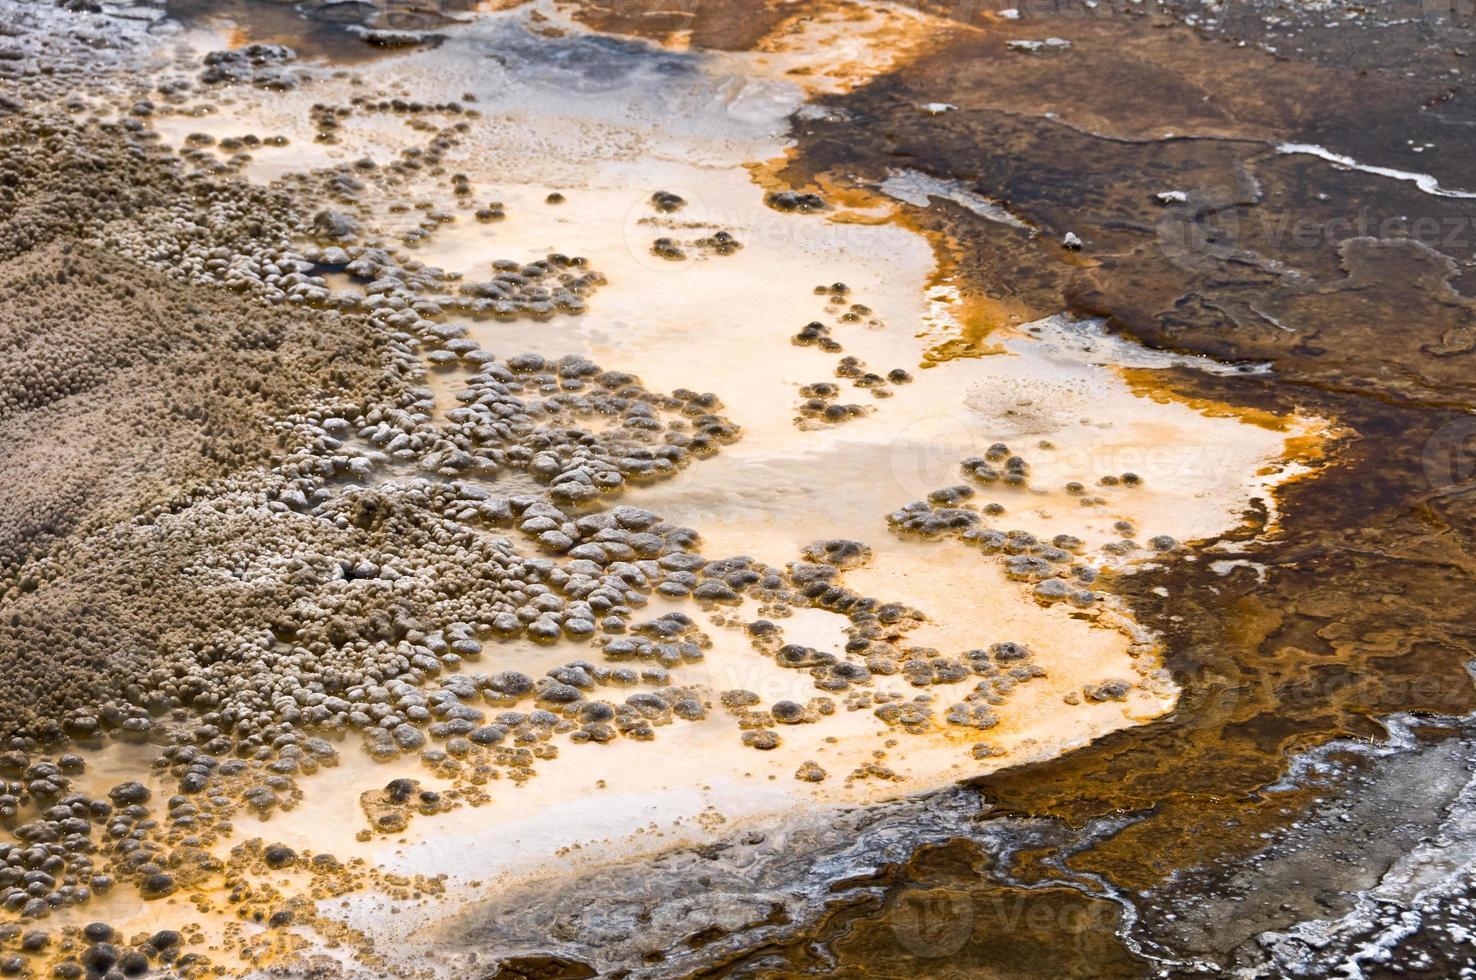 Upper Geyser Basin, Yellowstone National Park, États-Unis photo